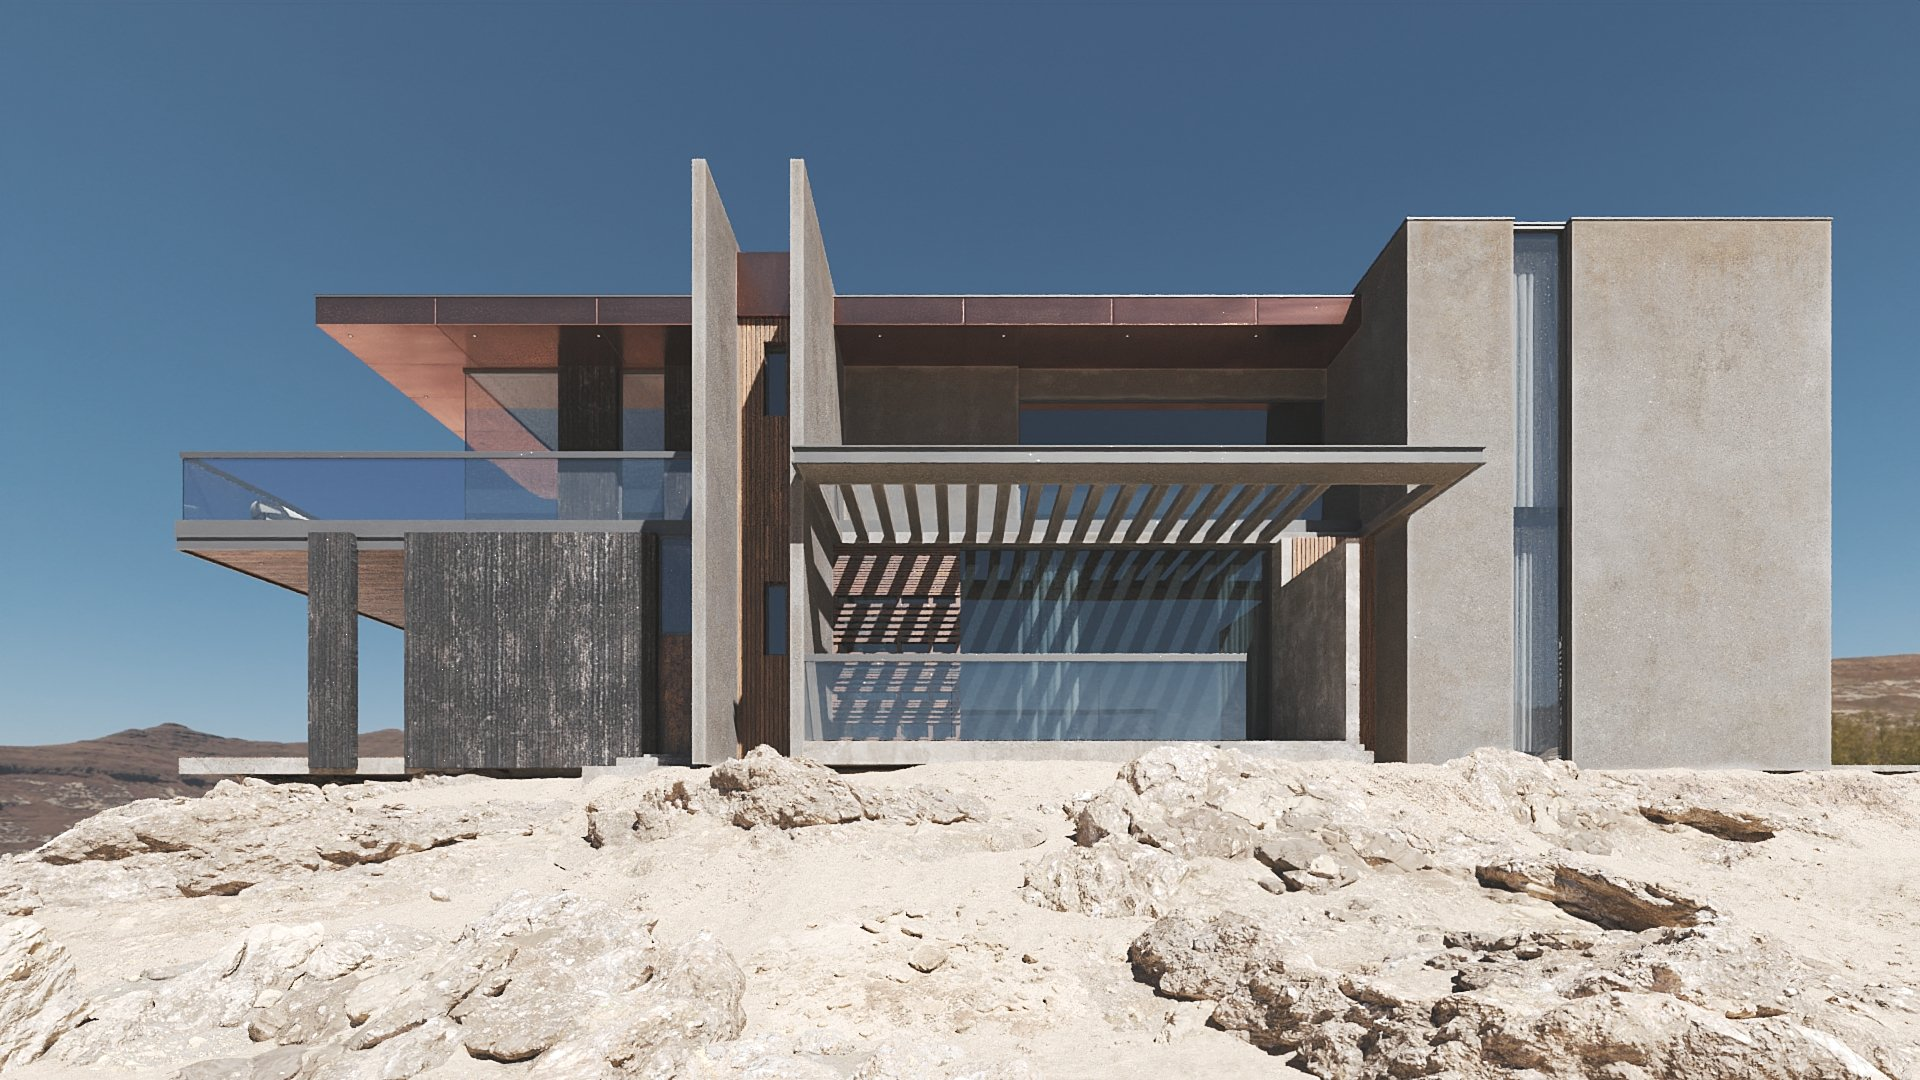 Landscape Developing for the Villa 3D Rendering